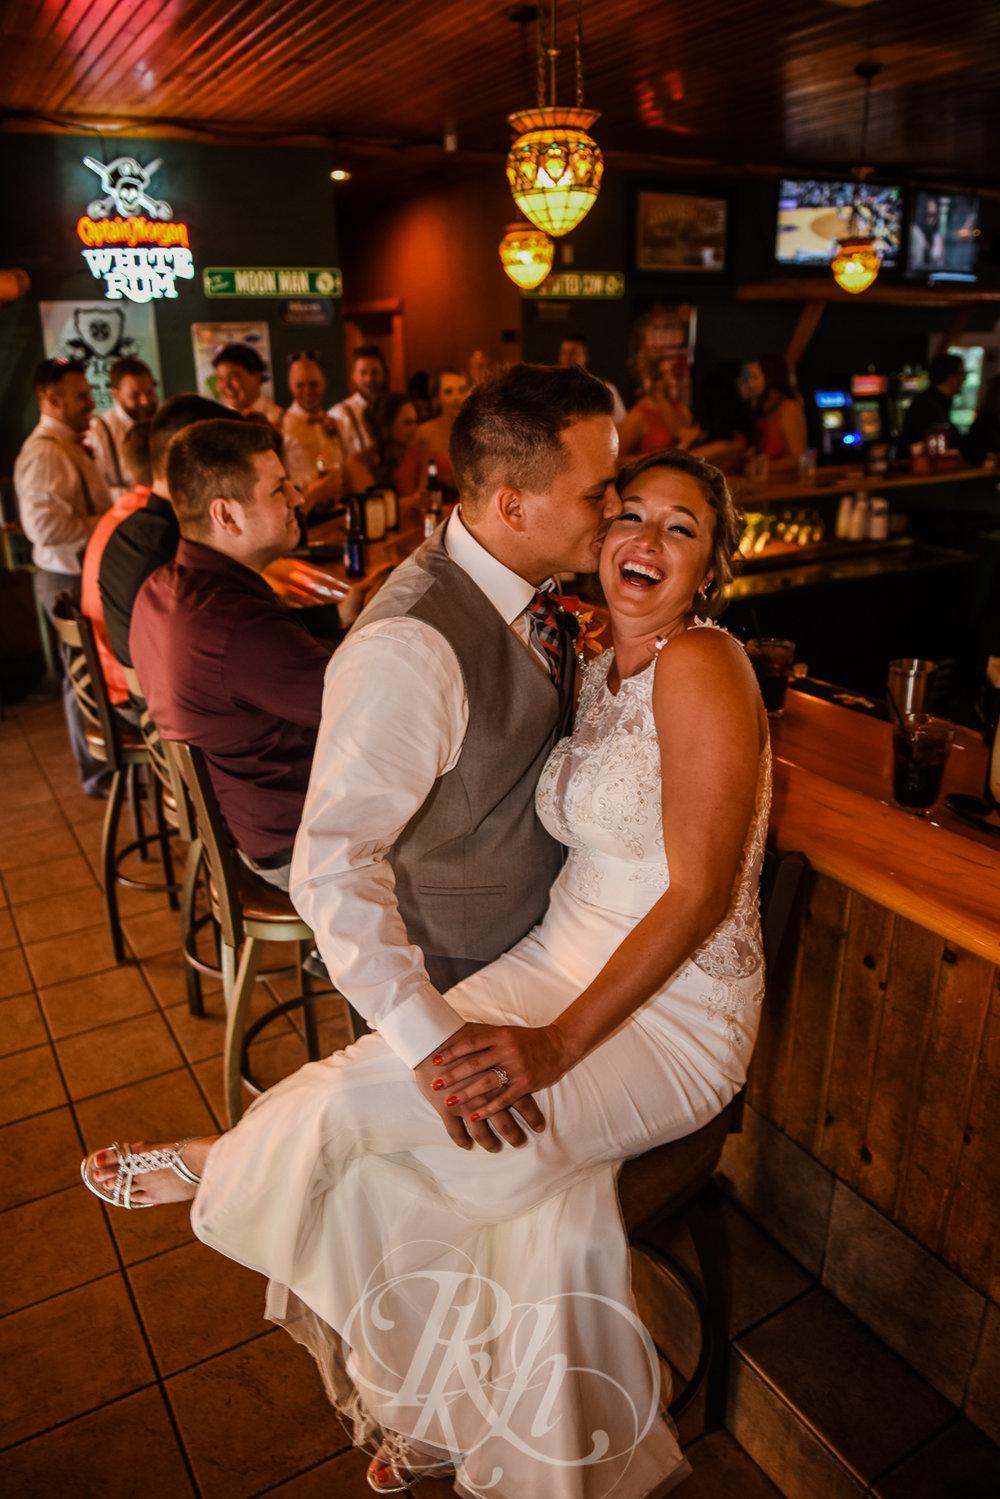 Kelsey & Kevin - Wisconsin Wedding Photography - RKH Images - Blog -6.jpg